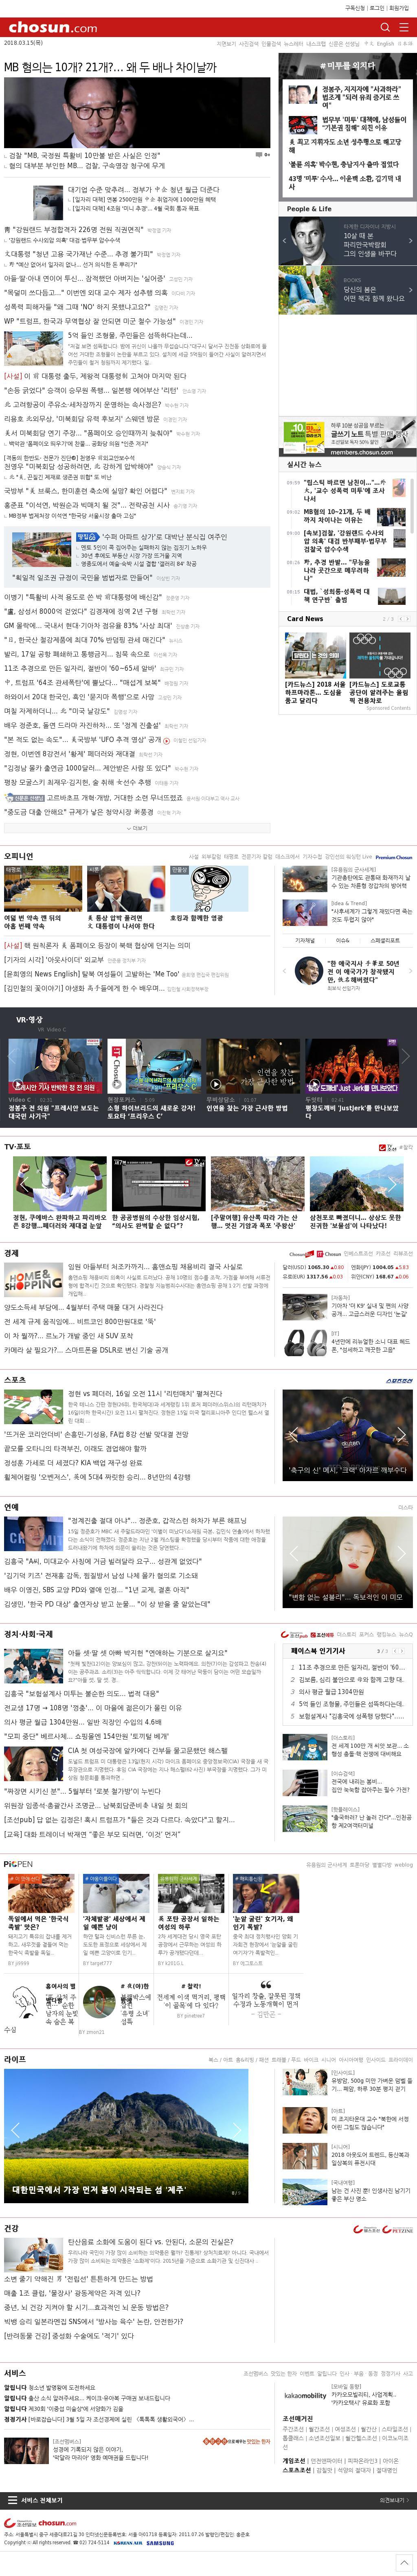 chosun.com at Thursday March 15, 2018, 12:01 p.m. UTC